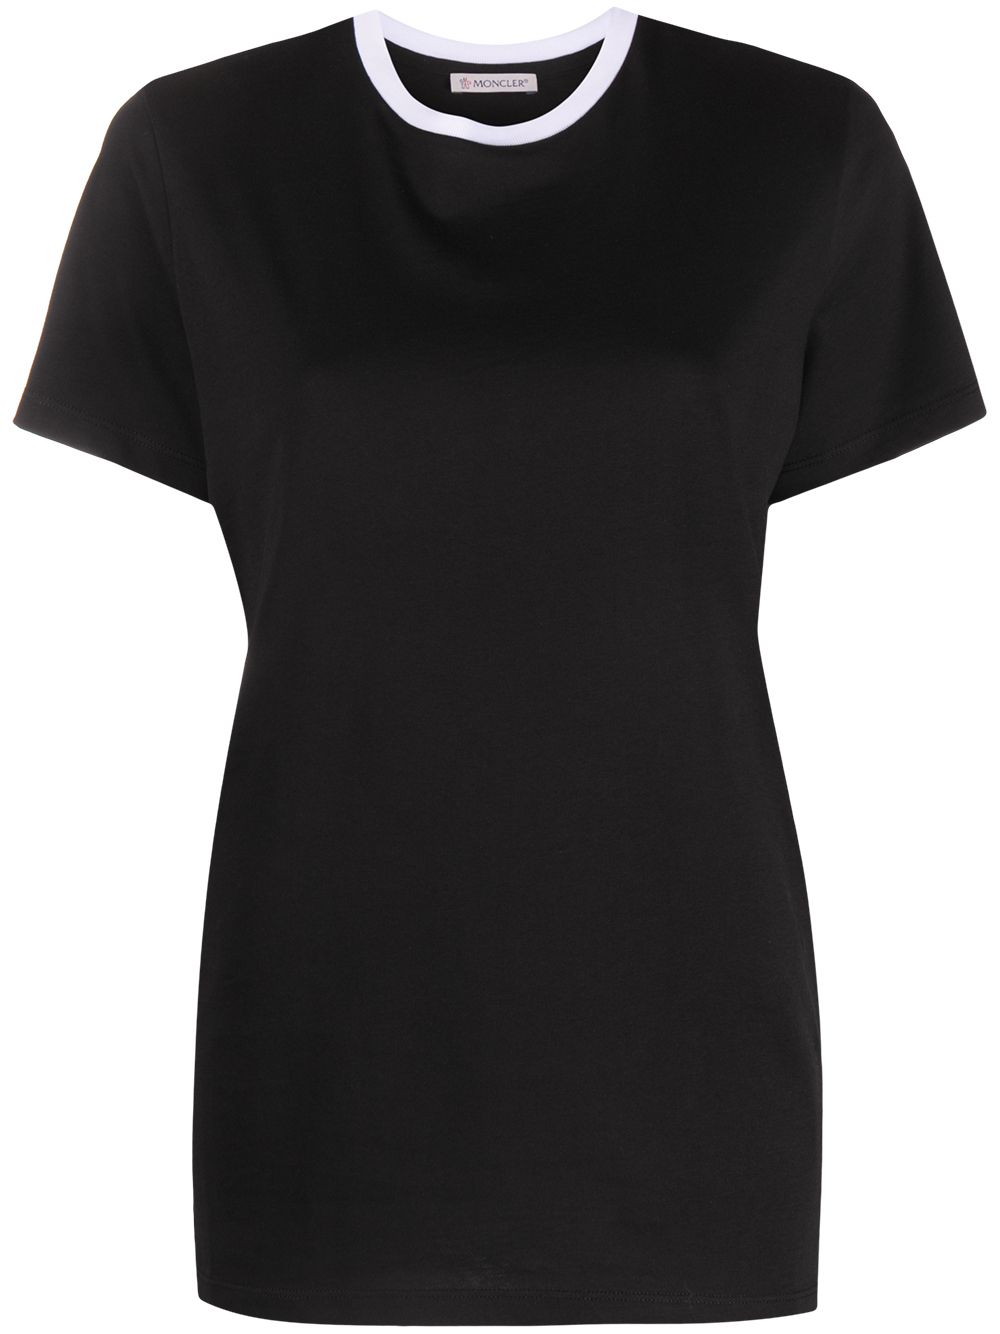 t-shirt in cotone nero con collo a contrasto bianco MONCLER   T-shirt   8C778-10-V8161999